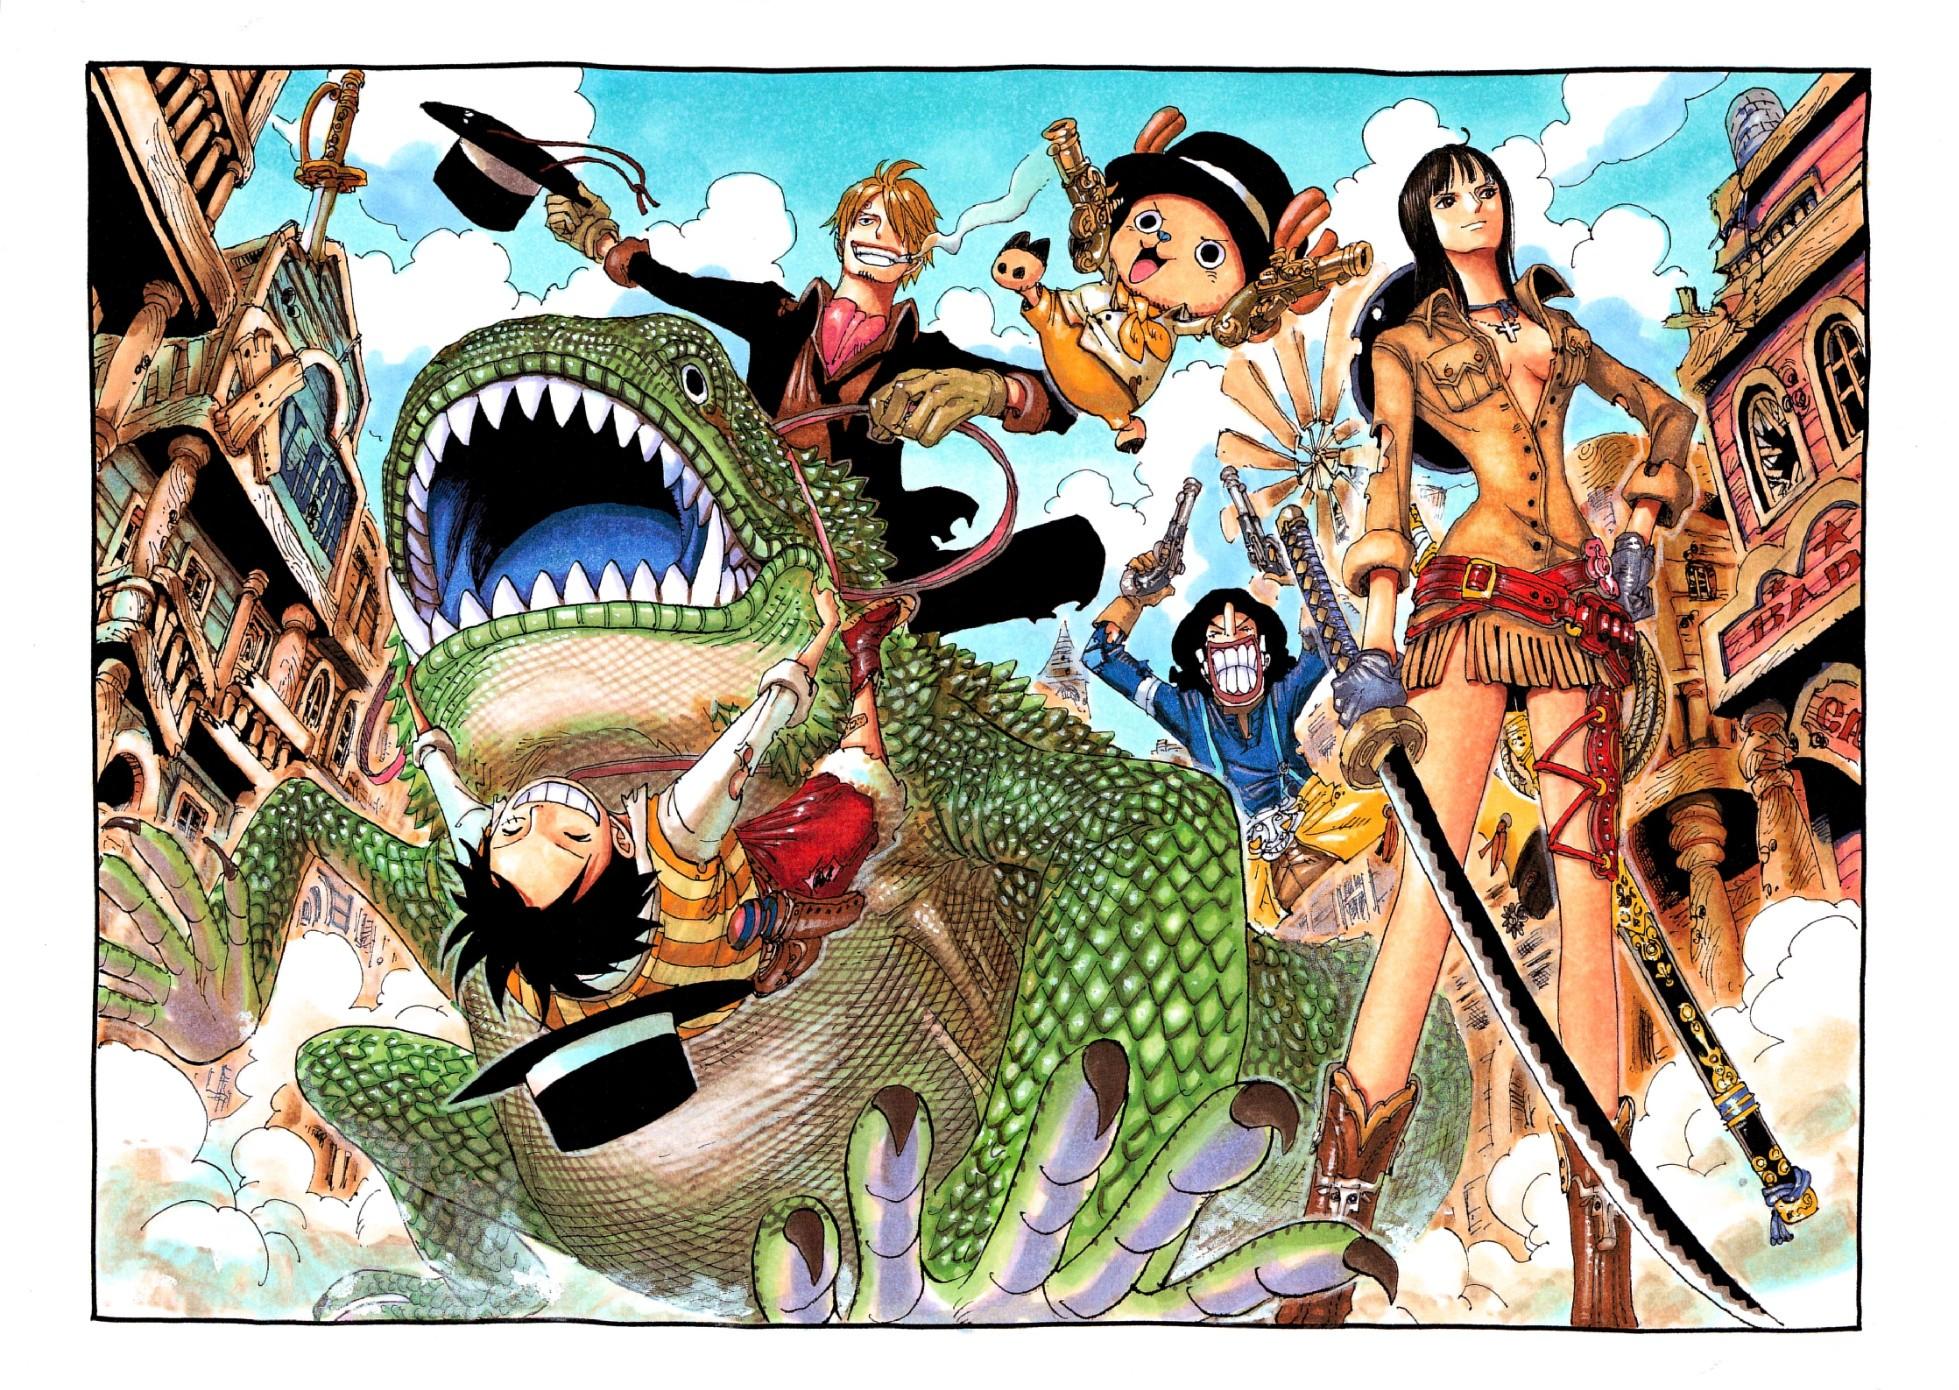 Wallpaper Illustration Collage Cartoon One Piece Sanji Monkey